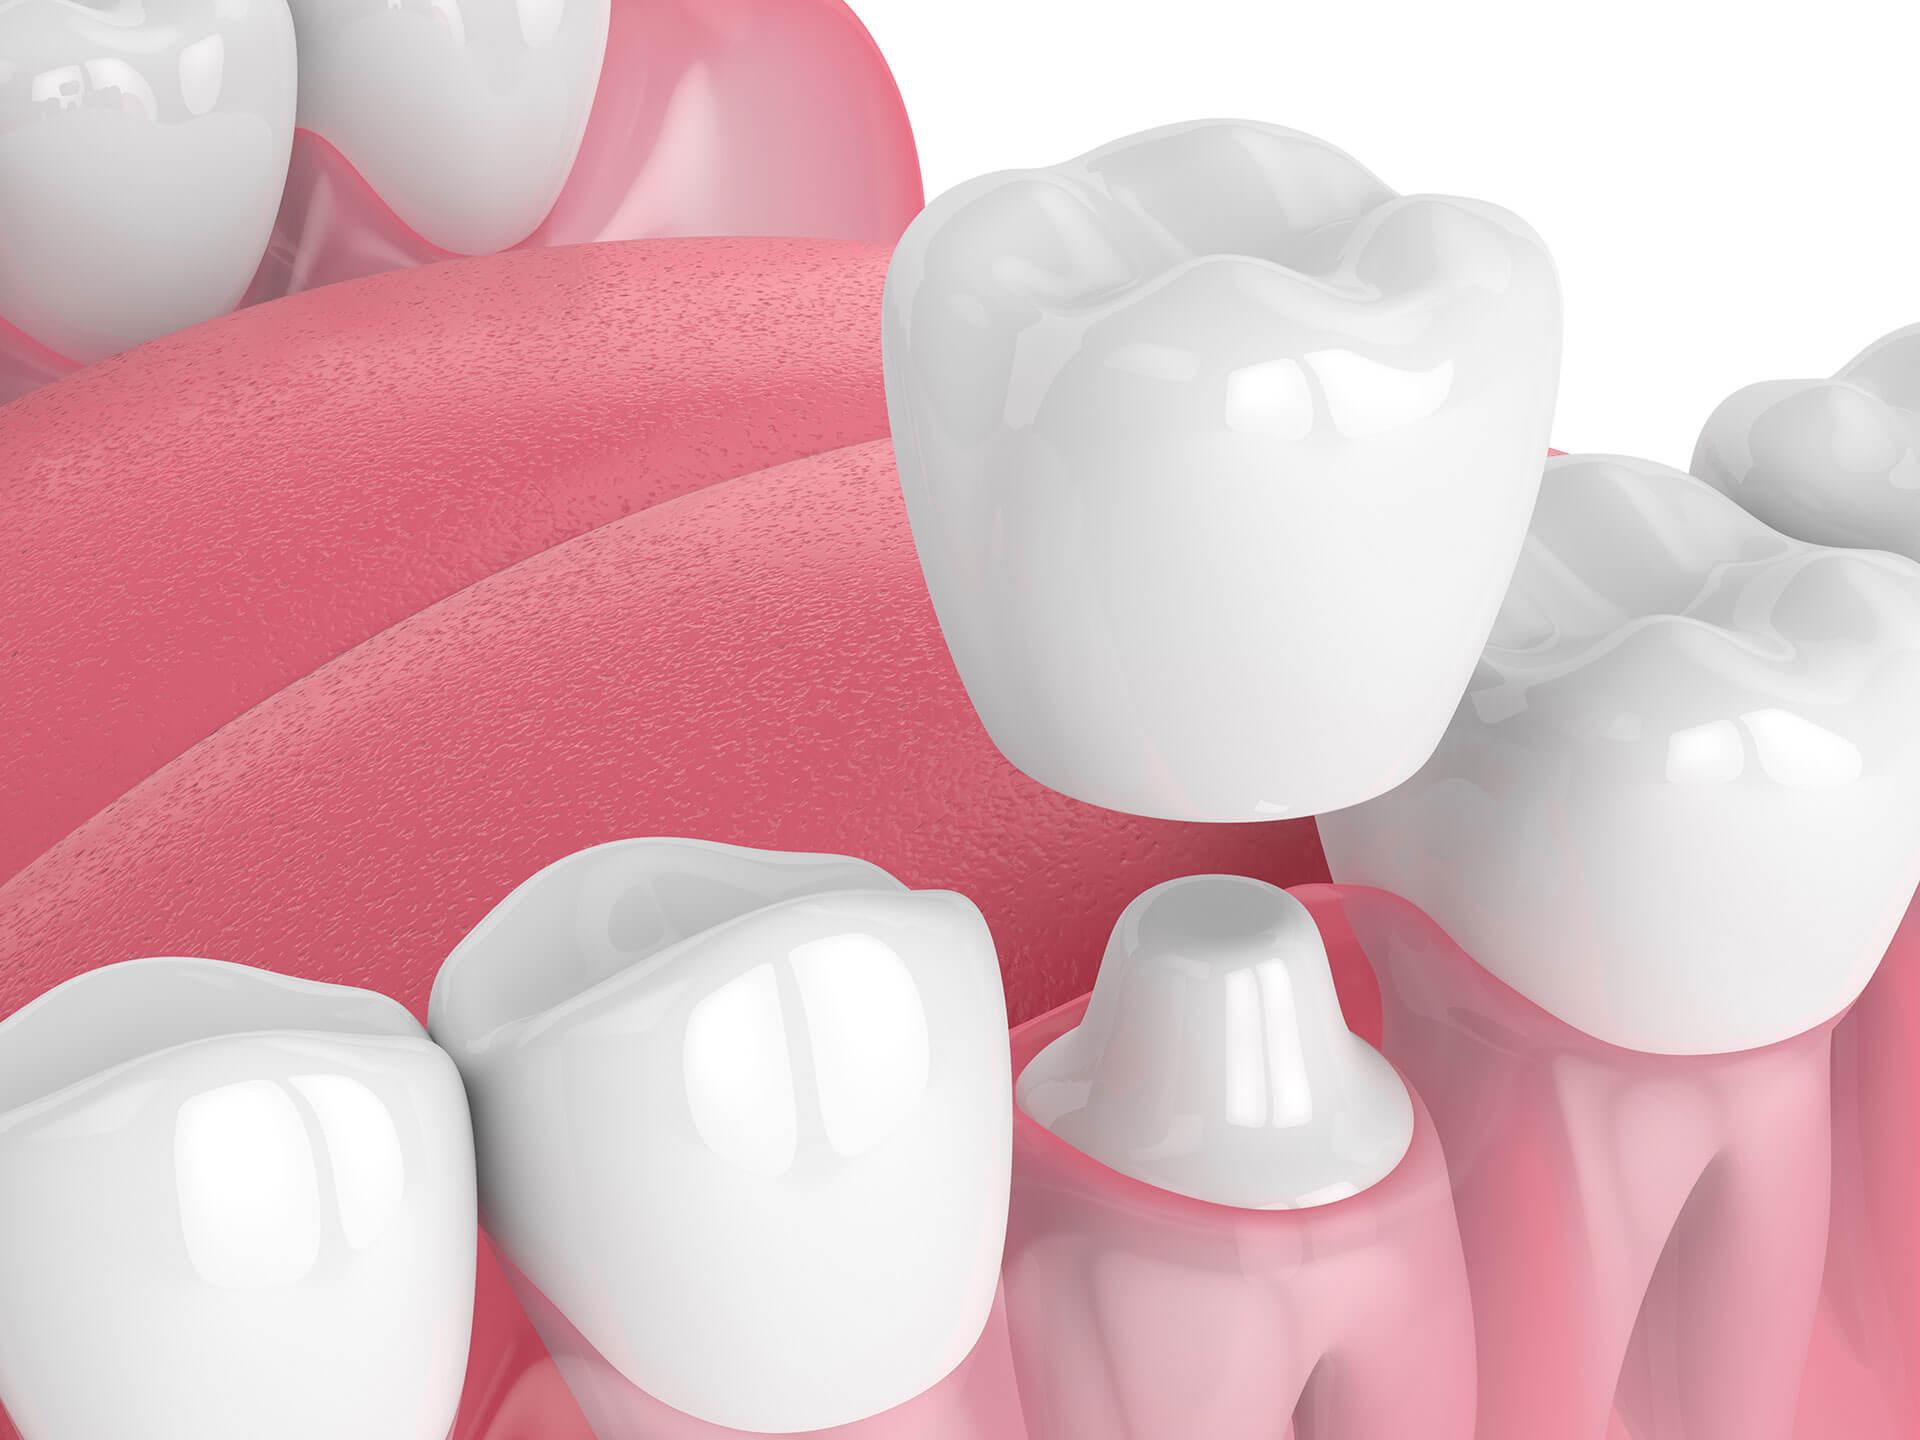 dental crowns in st augustine